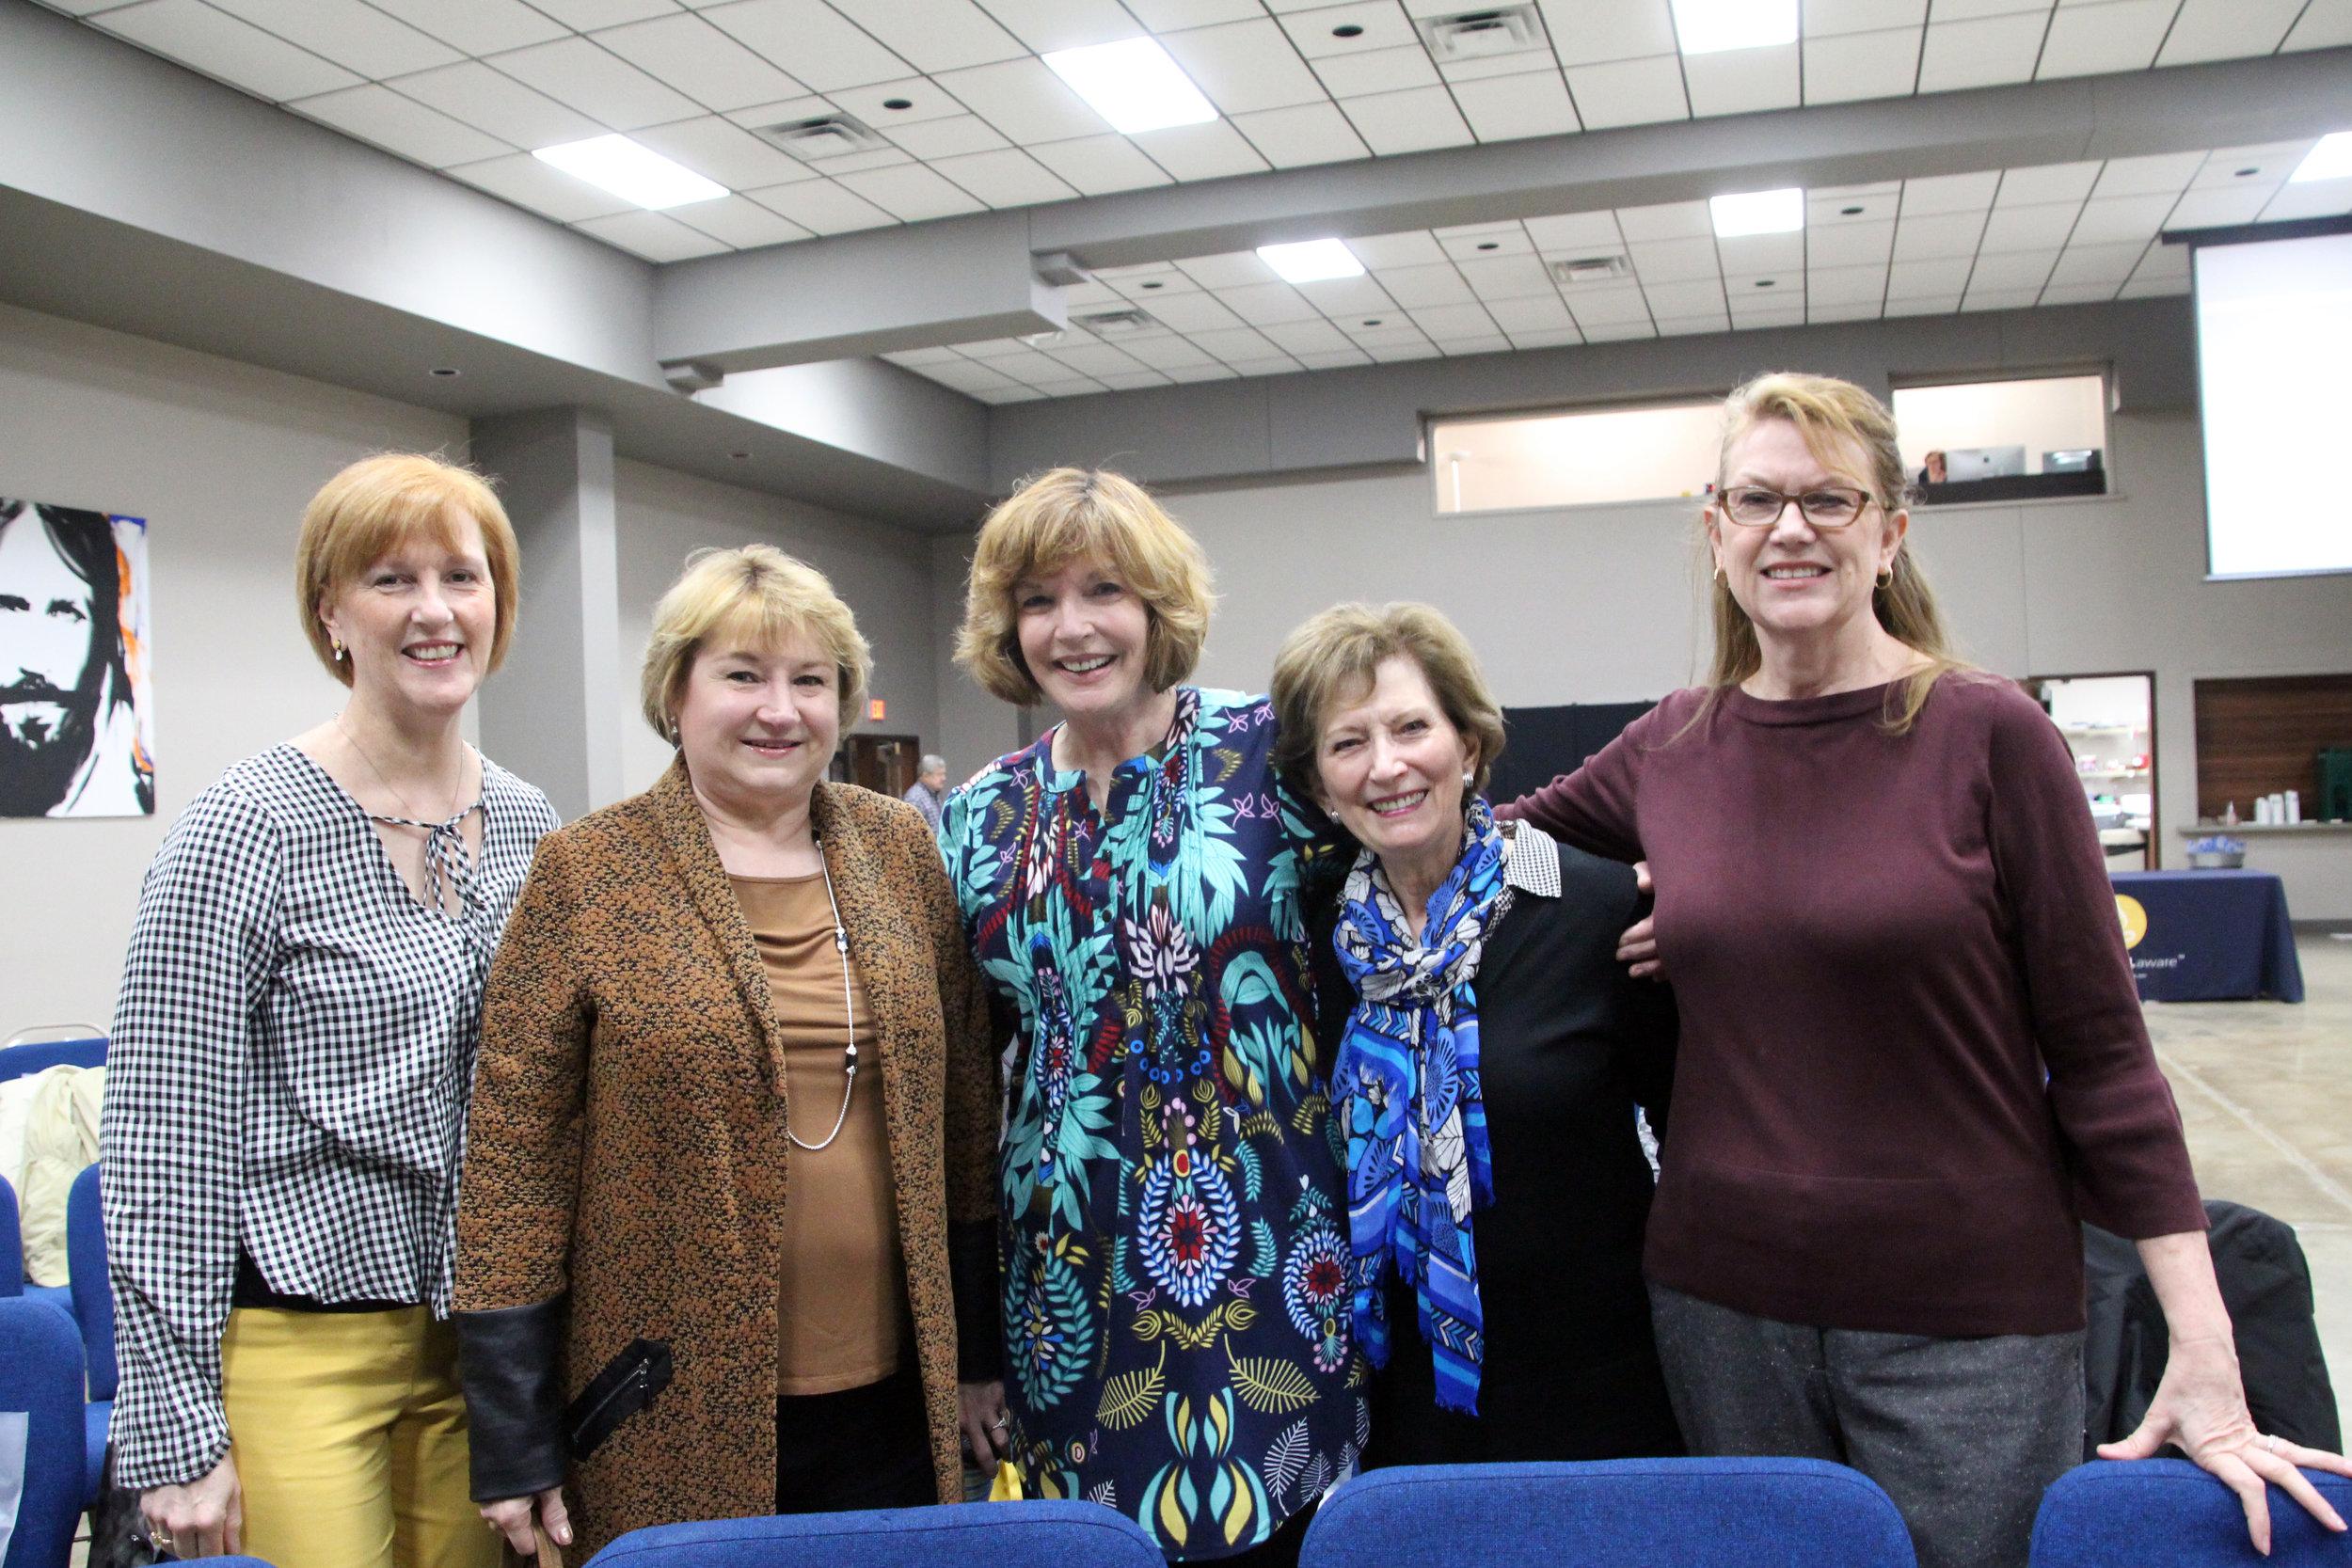 Cathy Long, Nancy Robbins, Scottie Burnett, Alice McMillan and Linda Hacker